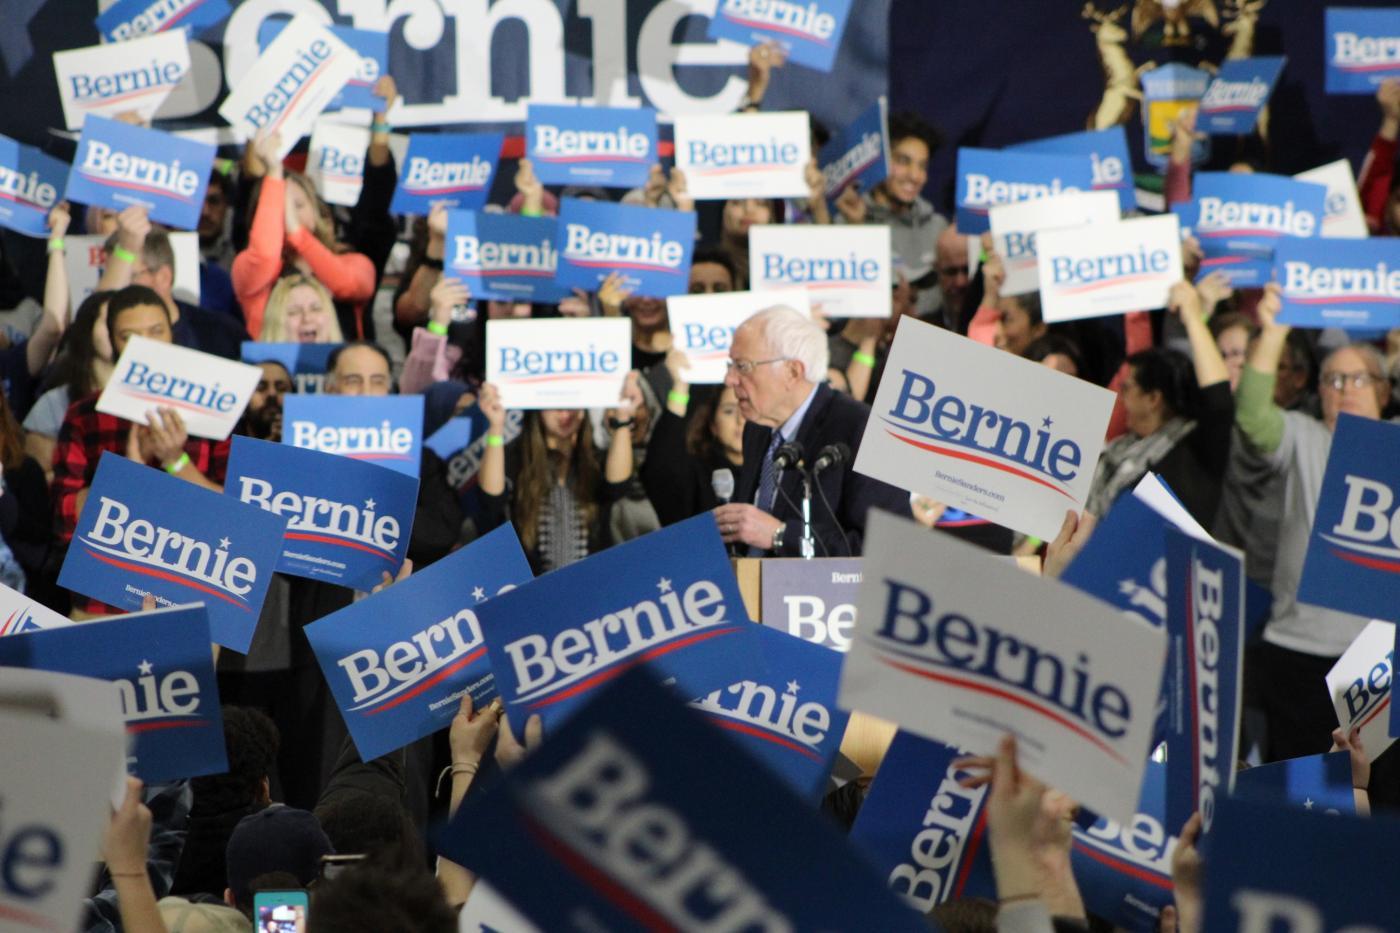 In Capital of Arab America, Bernie Sanders Pledges to Fight Discrimination